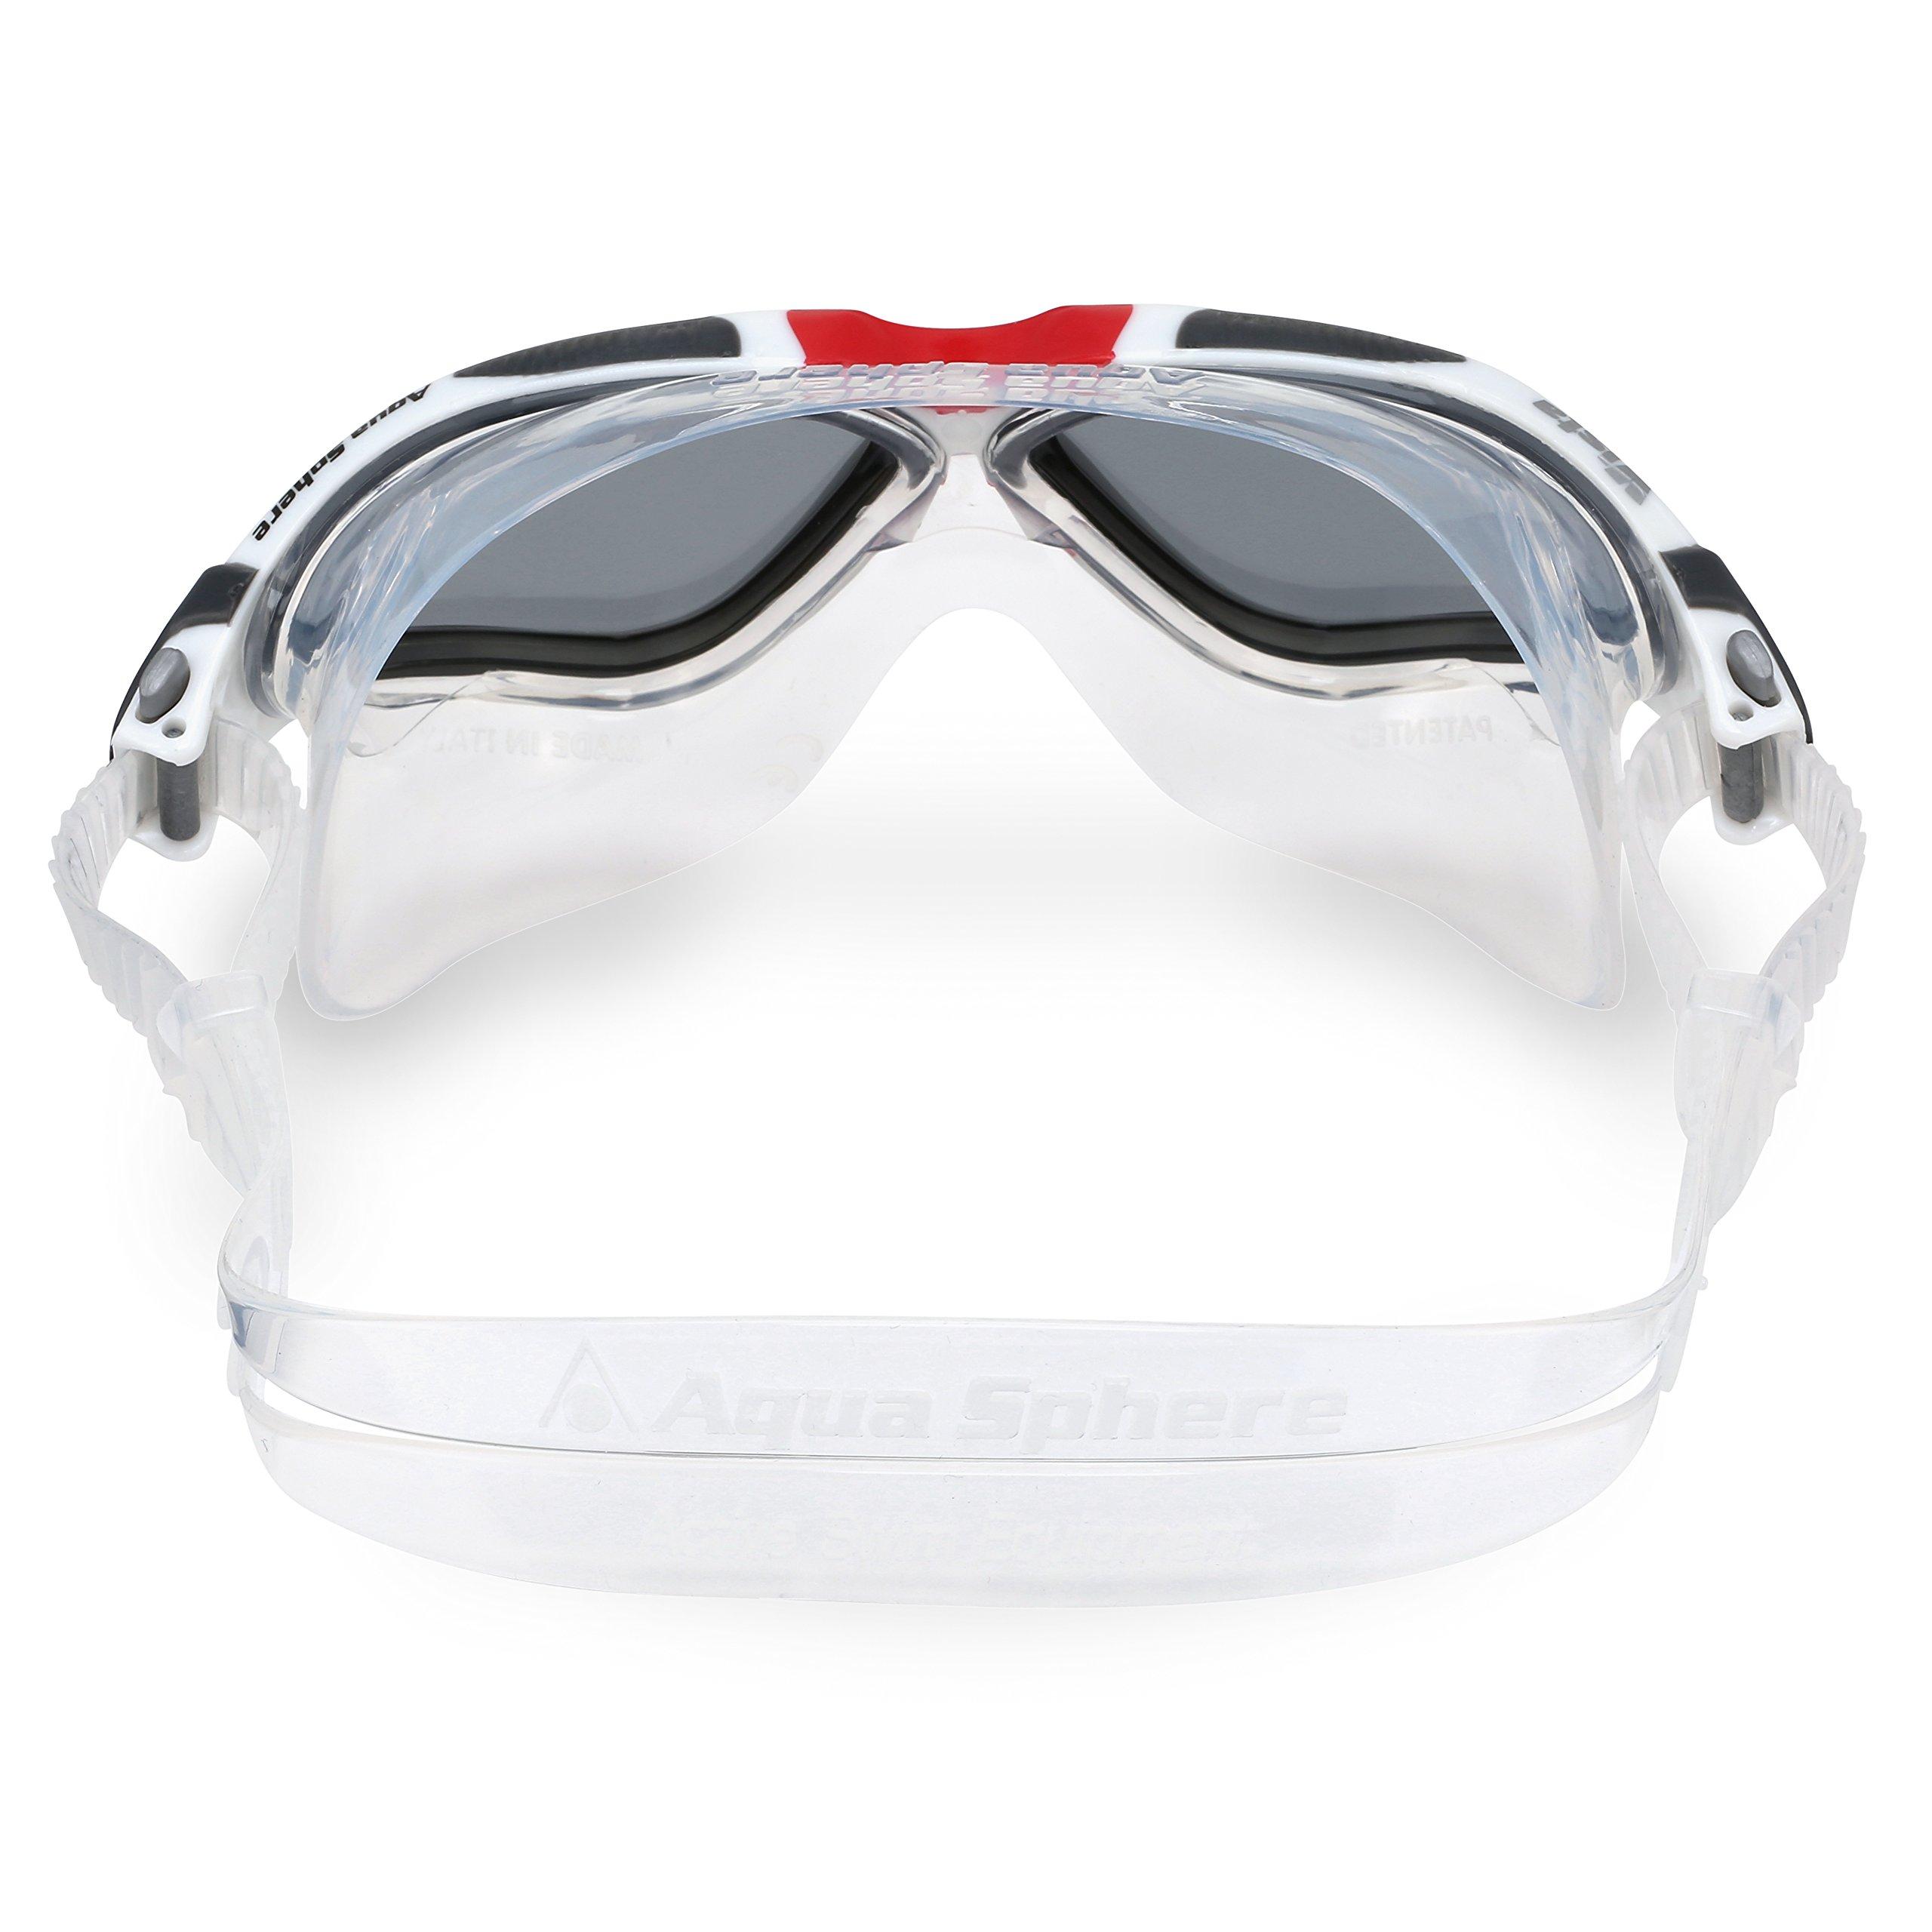 f693c63f51 Aqua Sphere Vista Swim Mask Goggles